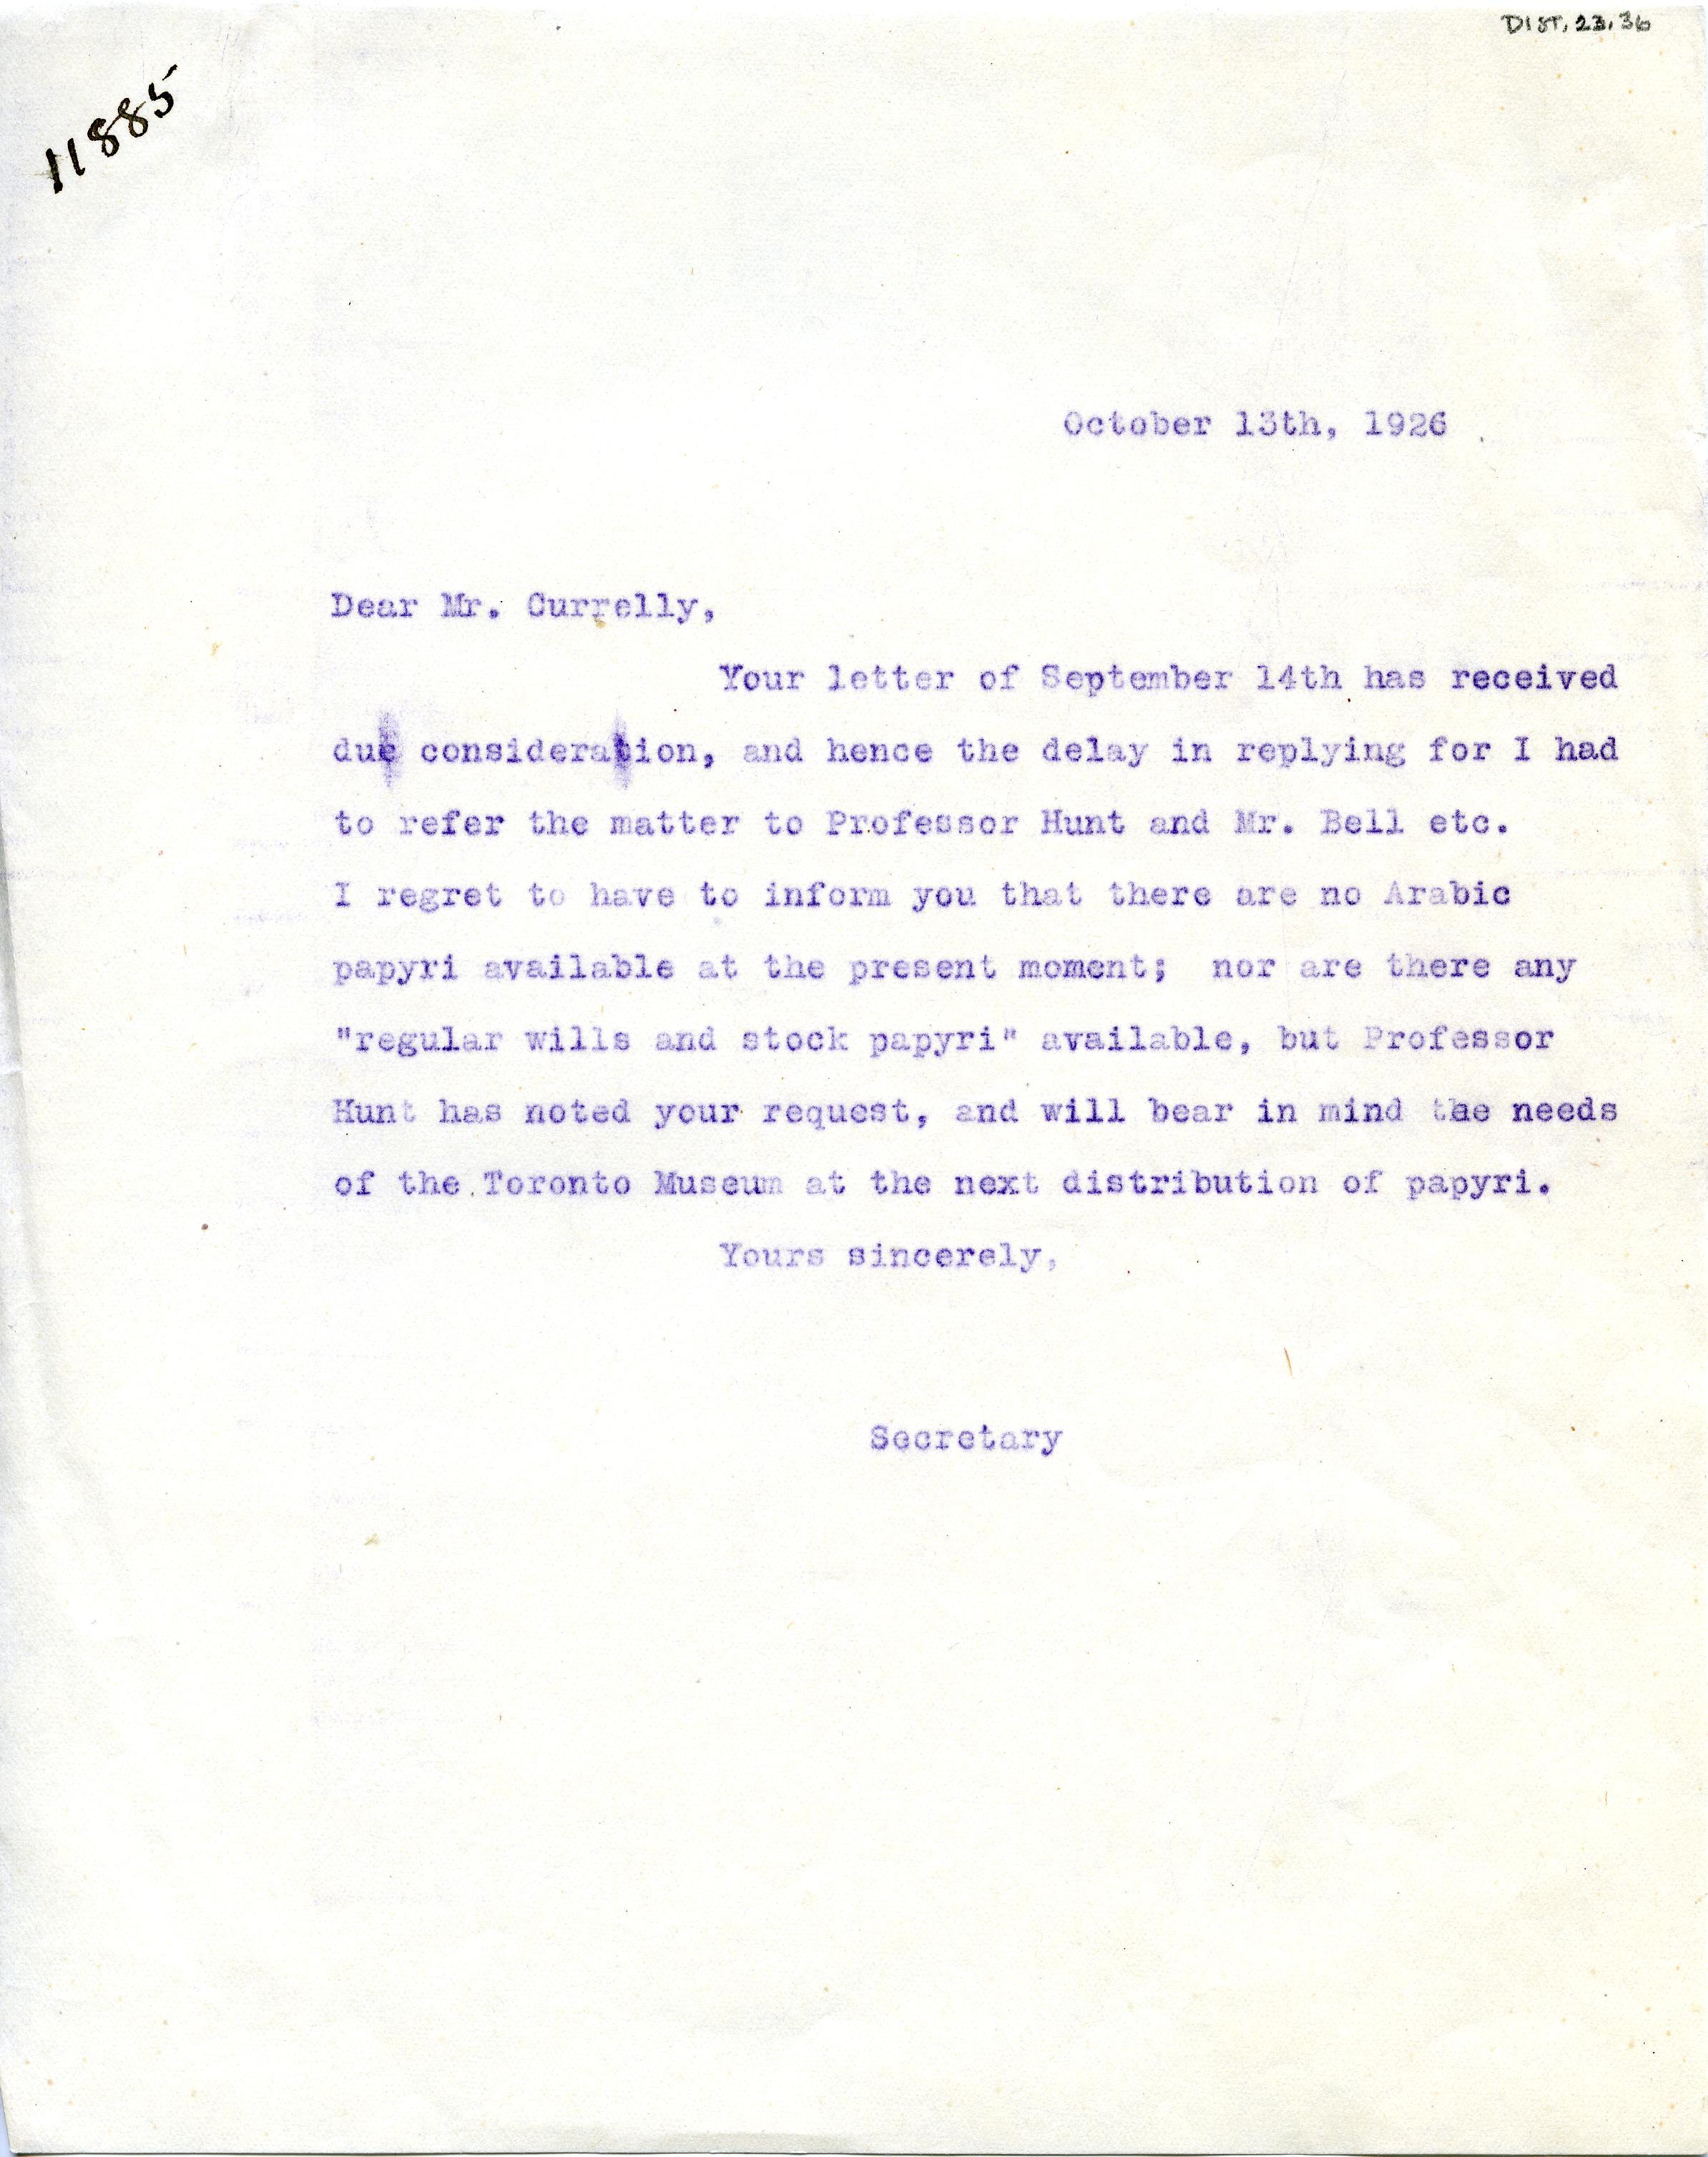 1904-05 Sinai, Deir el-Bahri, Oxyrhynchus, Naukratis DIST.23.36